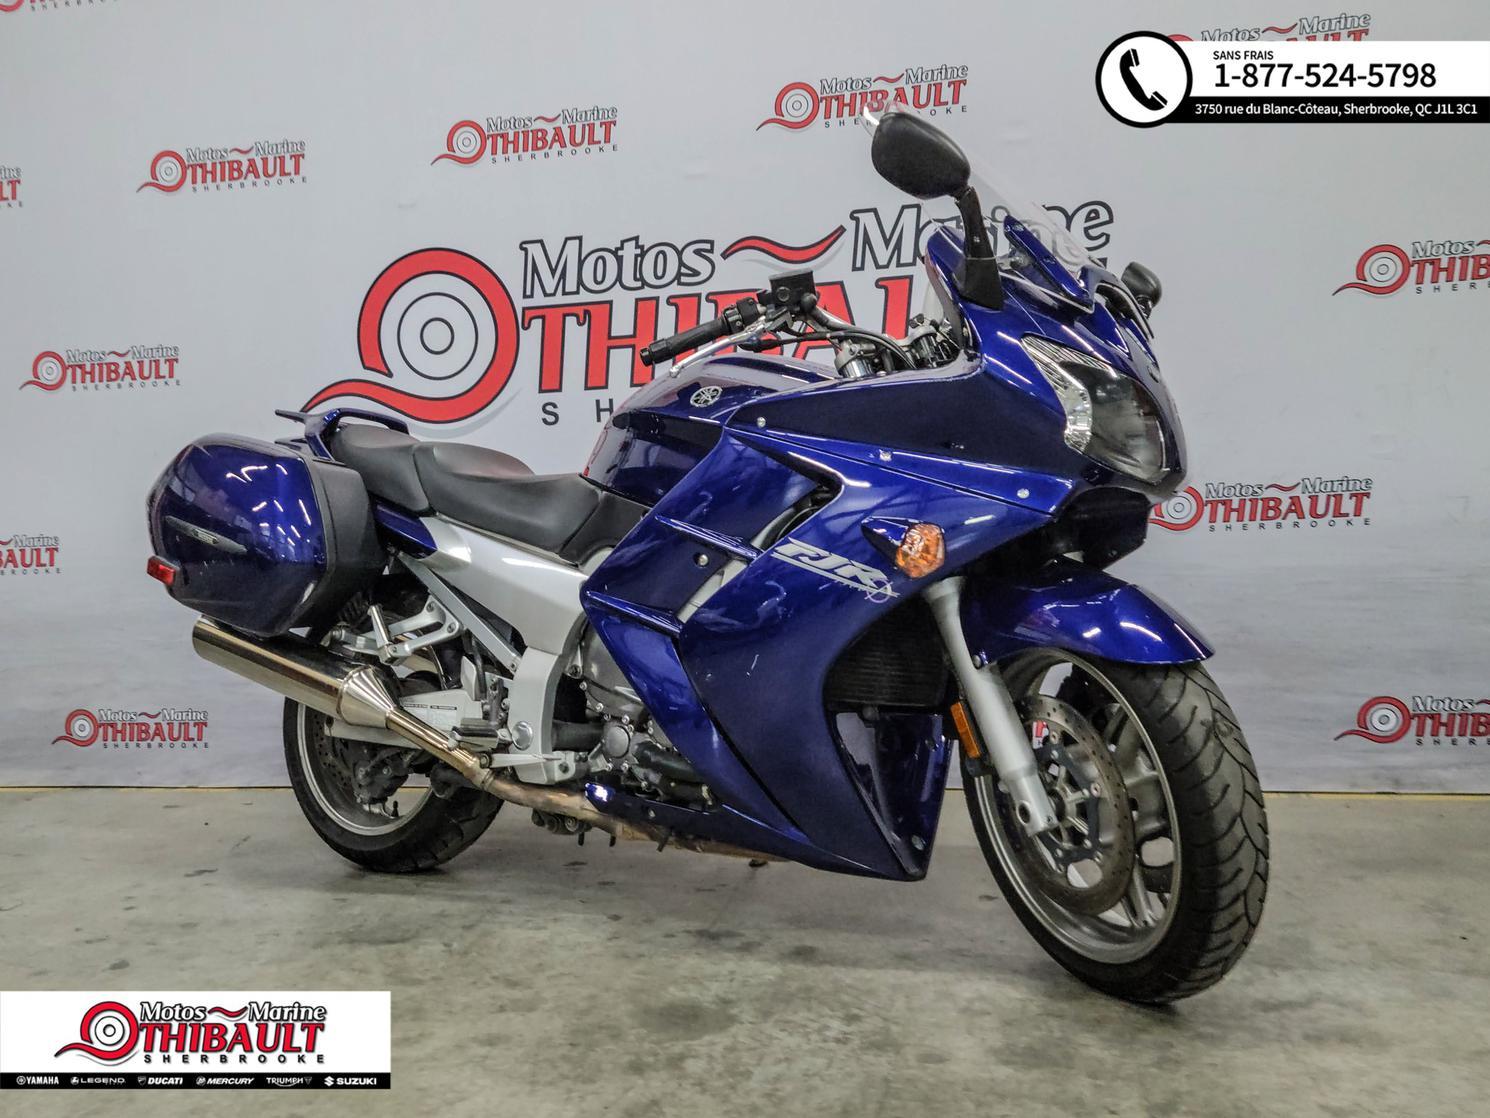 2005 Yamaha FJR 1300